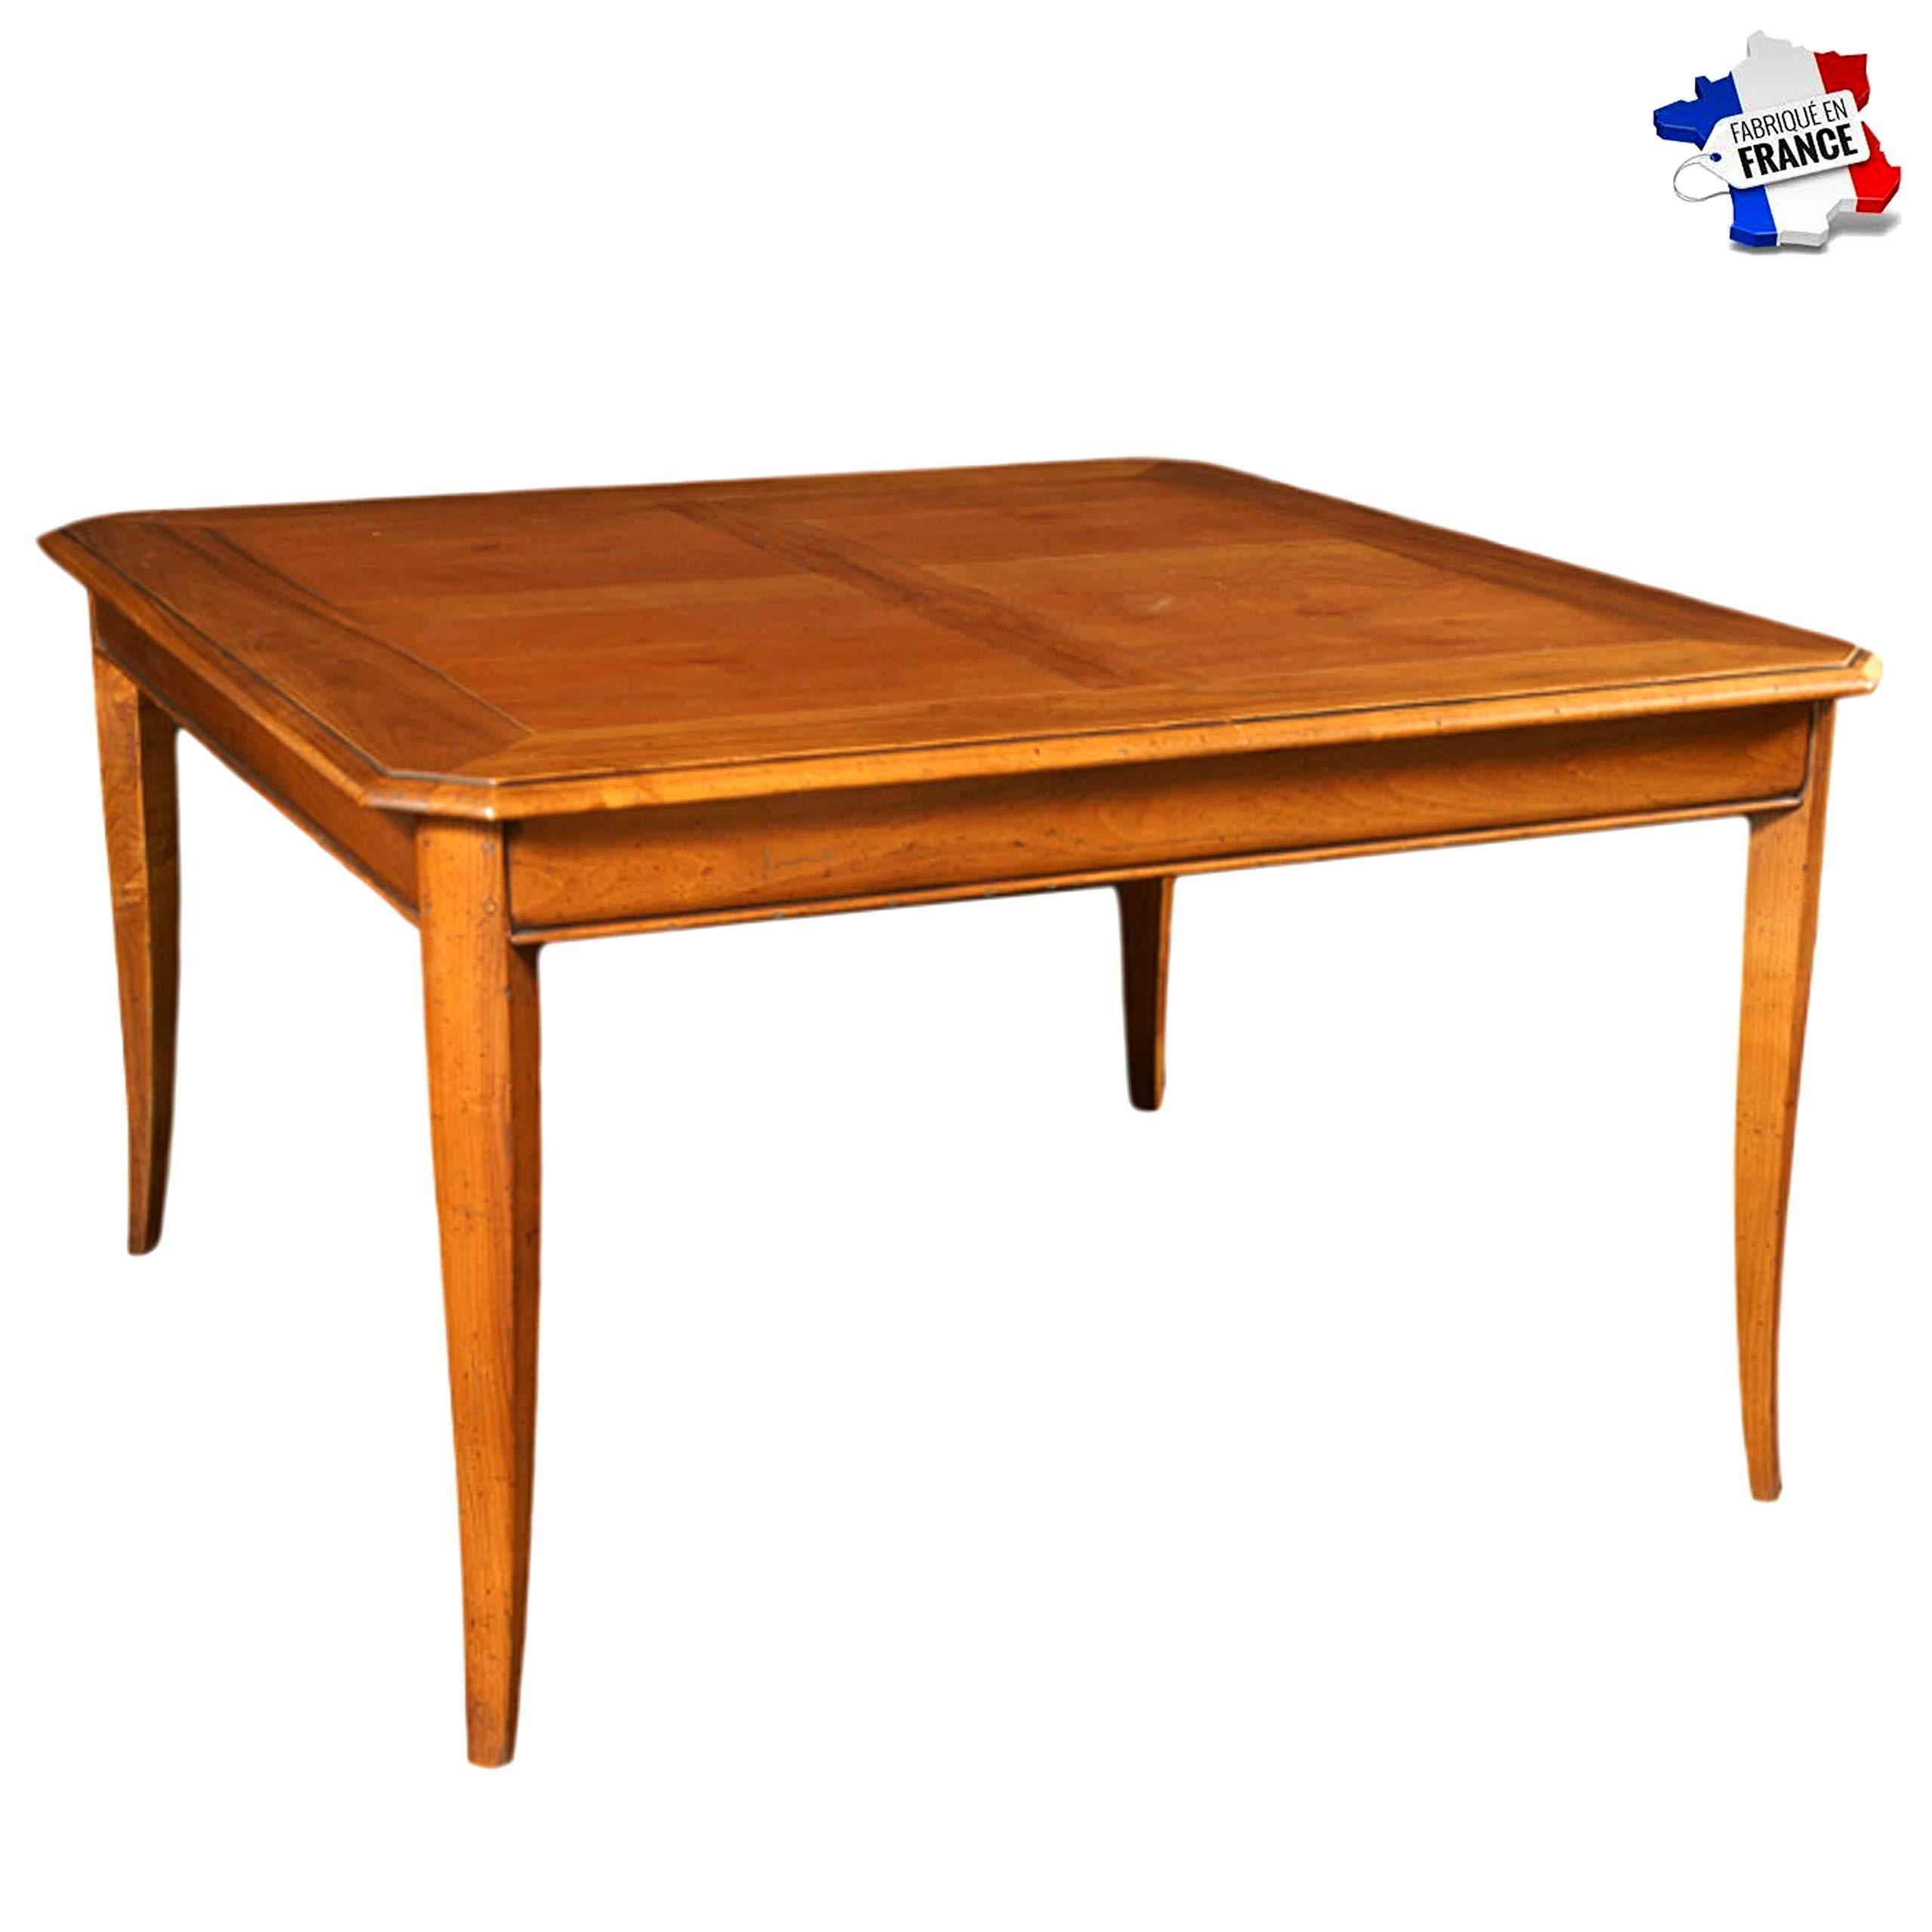 GONTIER - Mesa cuadrada de madera maciza – 100% Made in France: Amazon.es: Hogar